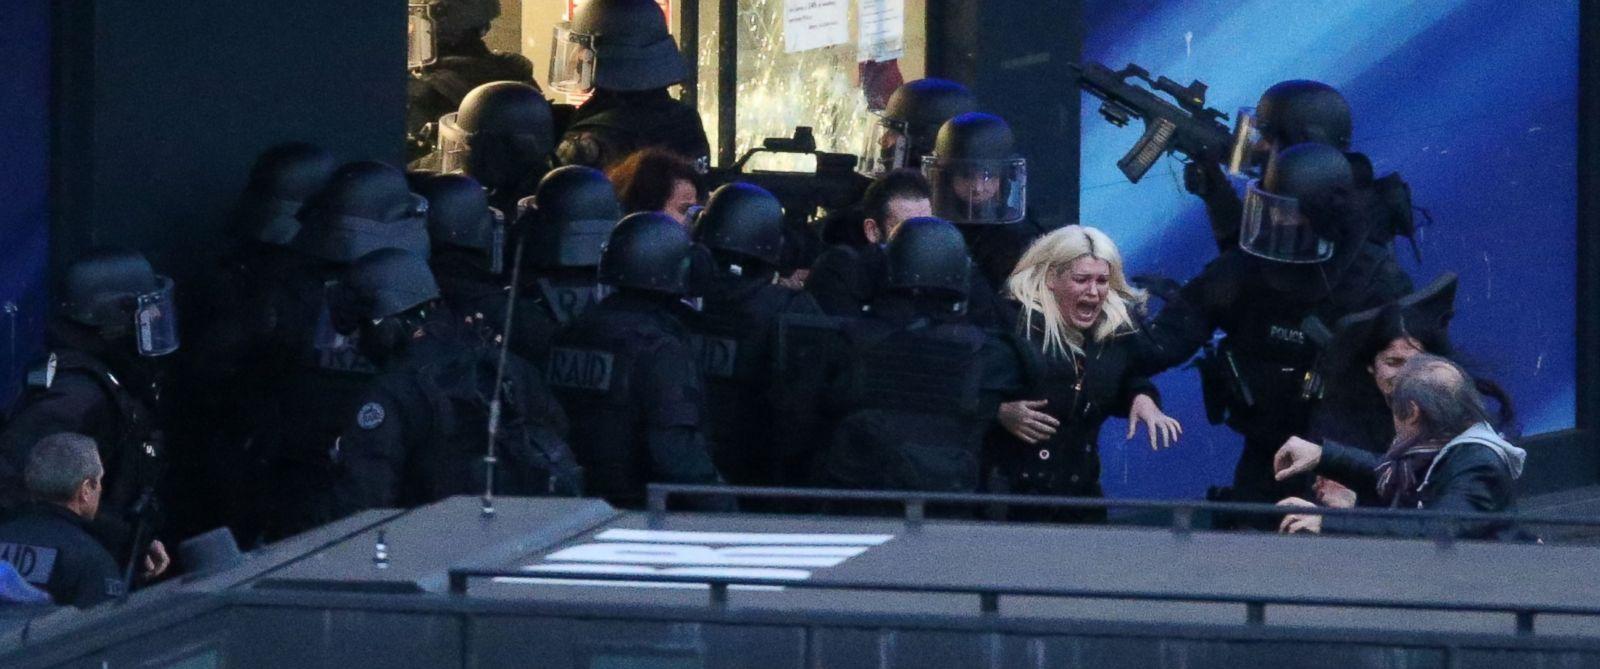 PHOTO: Police forces storm the Hyper Cacher kosher grocery store in Porte de Vincennes, eastern Paris, France on Jan. 9, 2015.